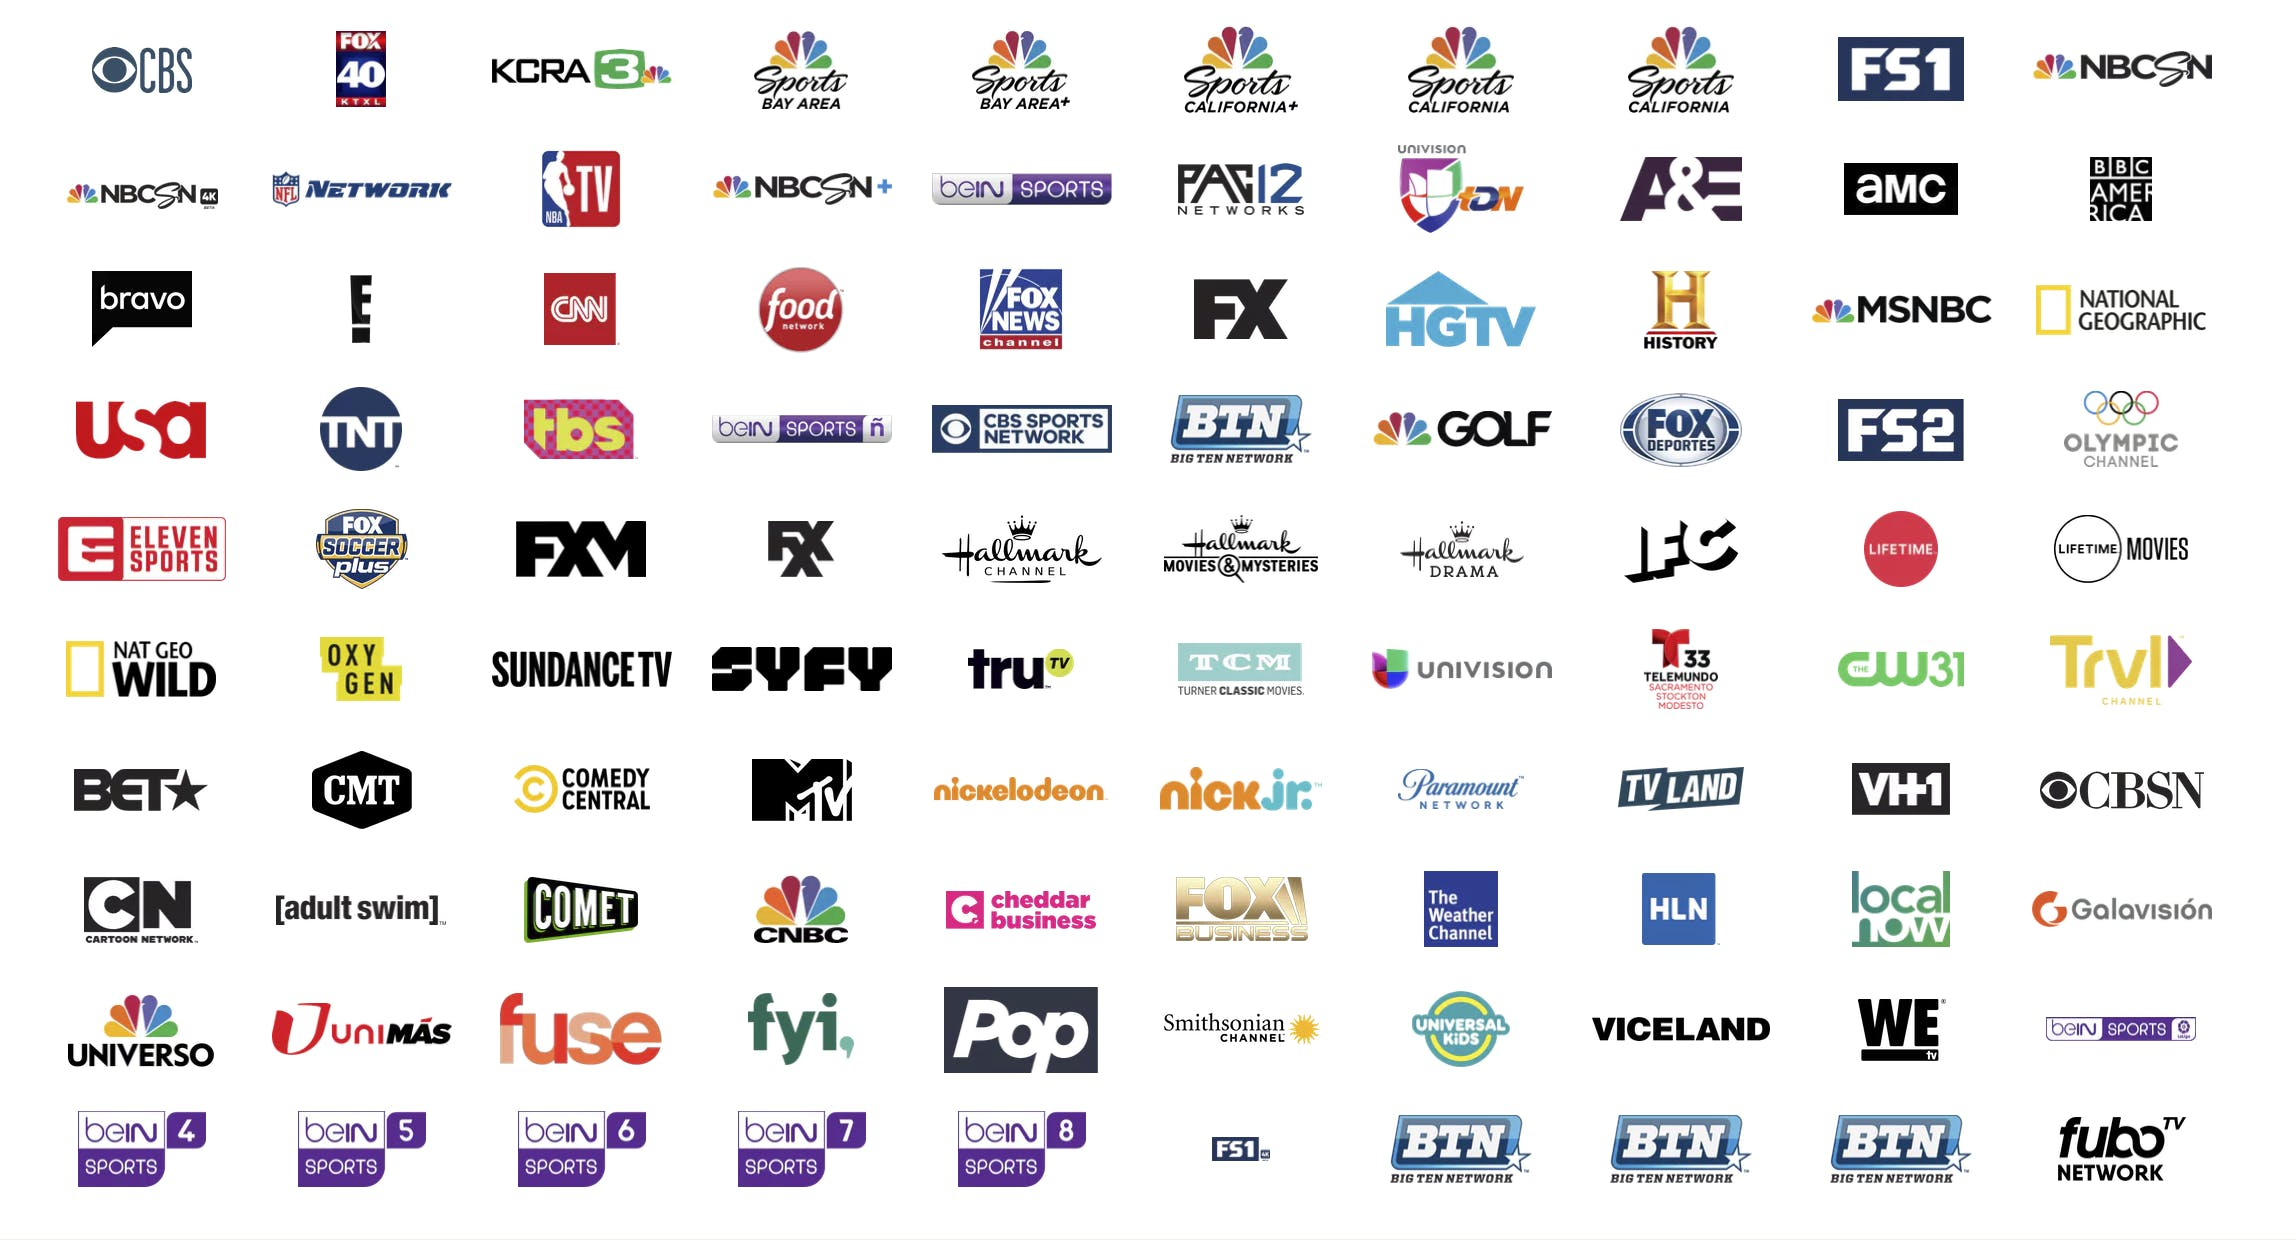 watch american ninja warrior season 11 online free on FuboTV